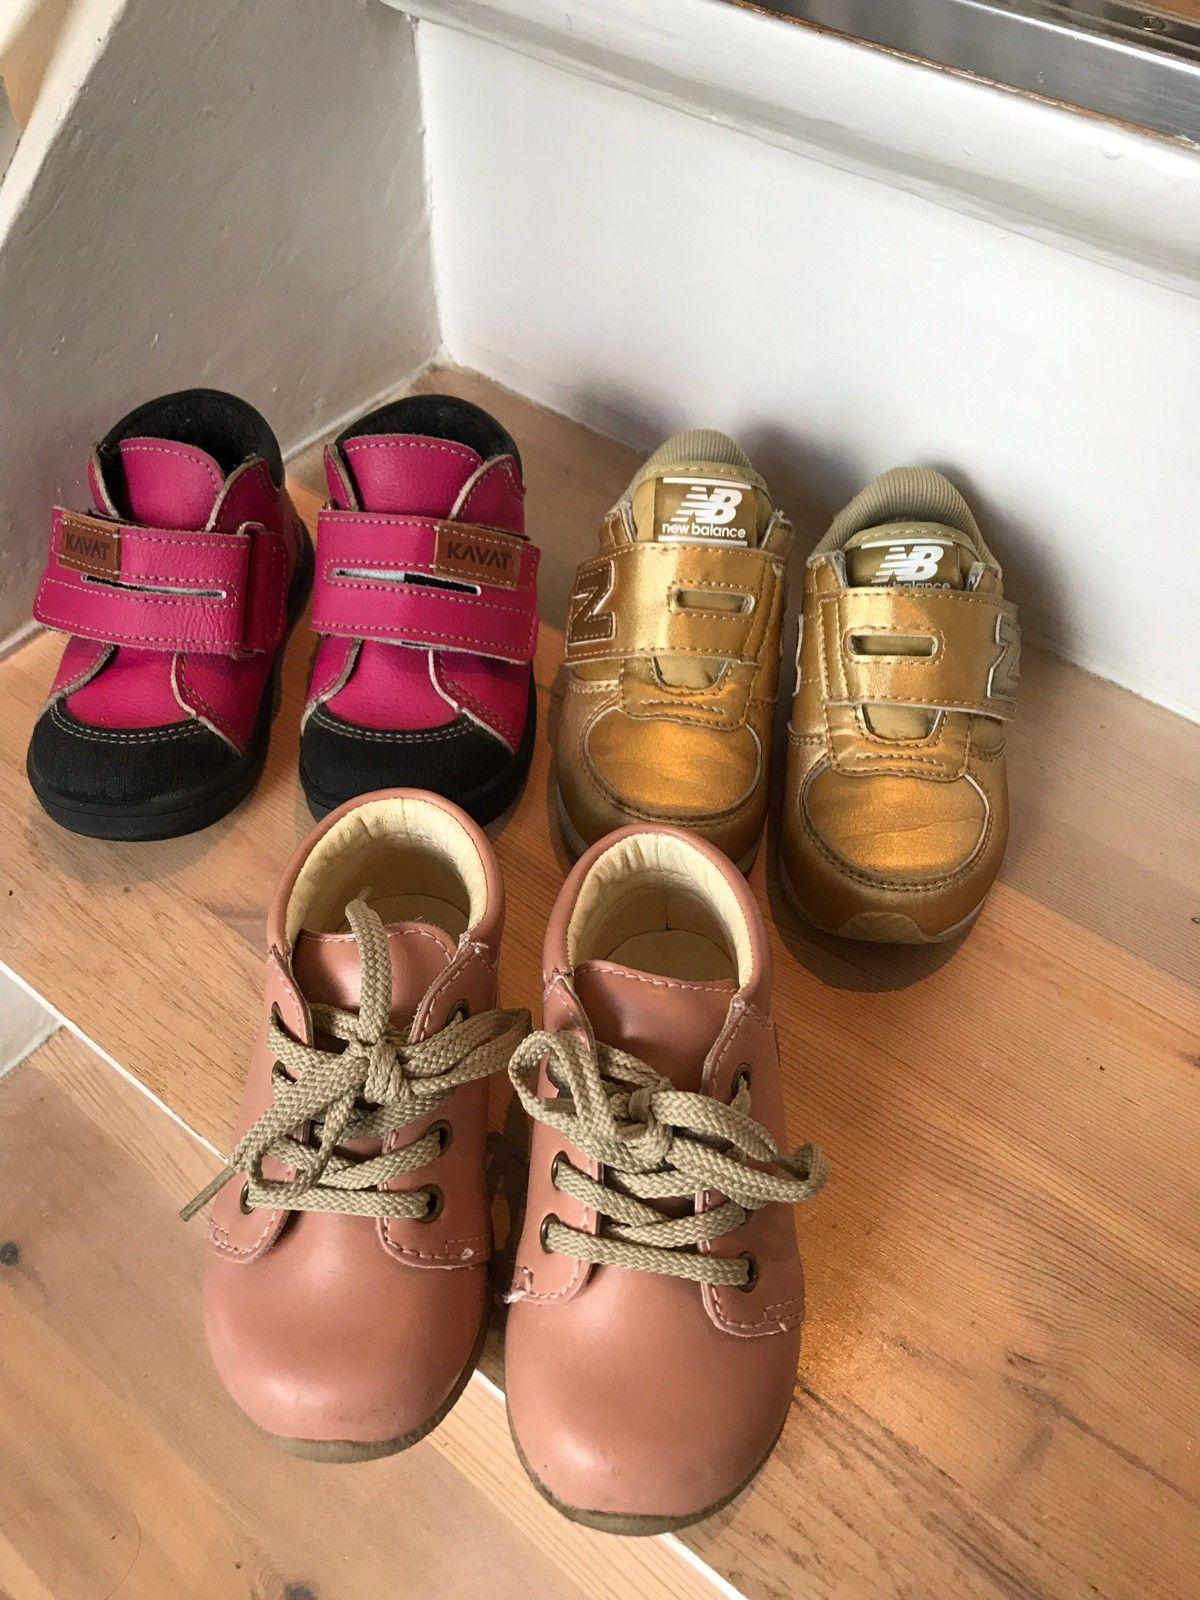 Pent brukt sko: Kavat Bisgaard Enfant Angulus New